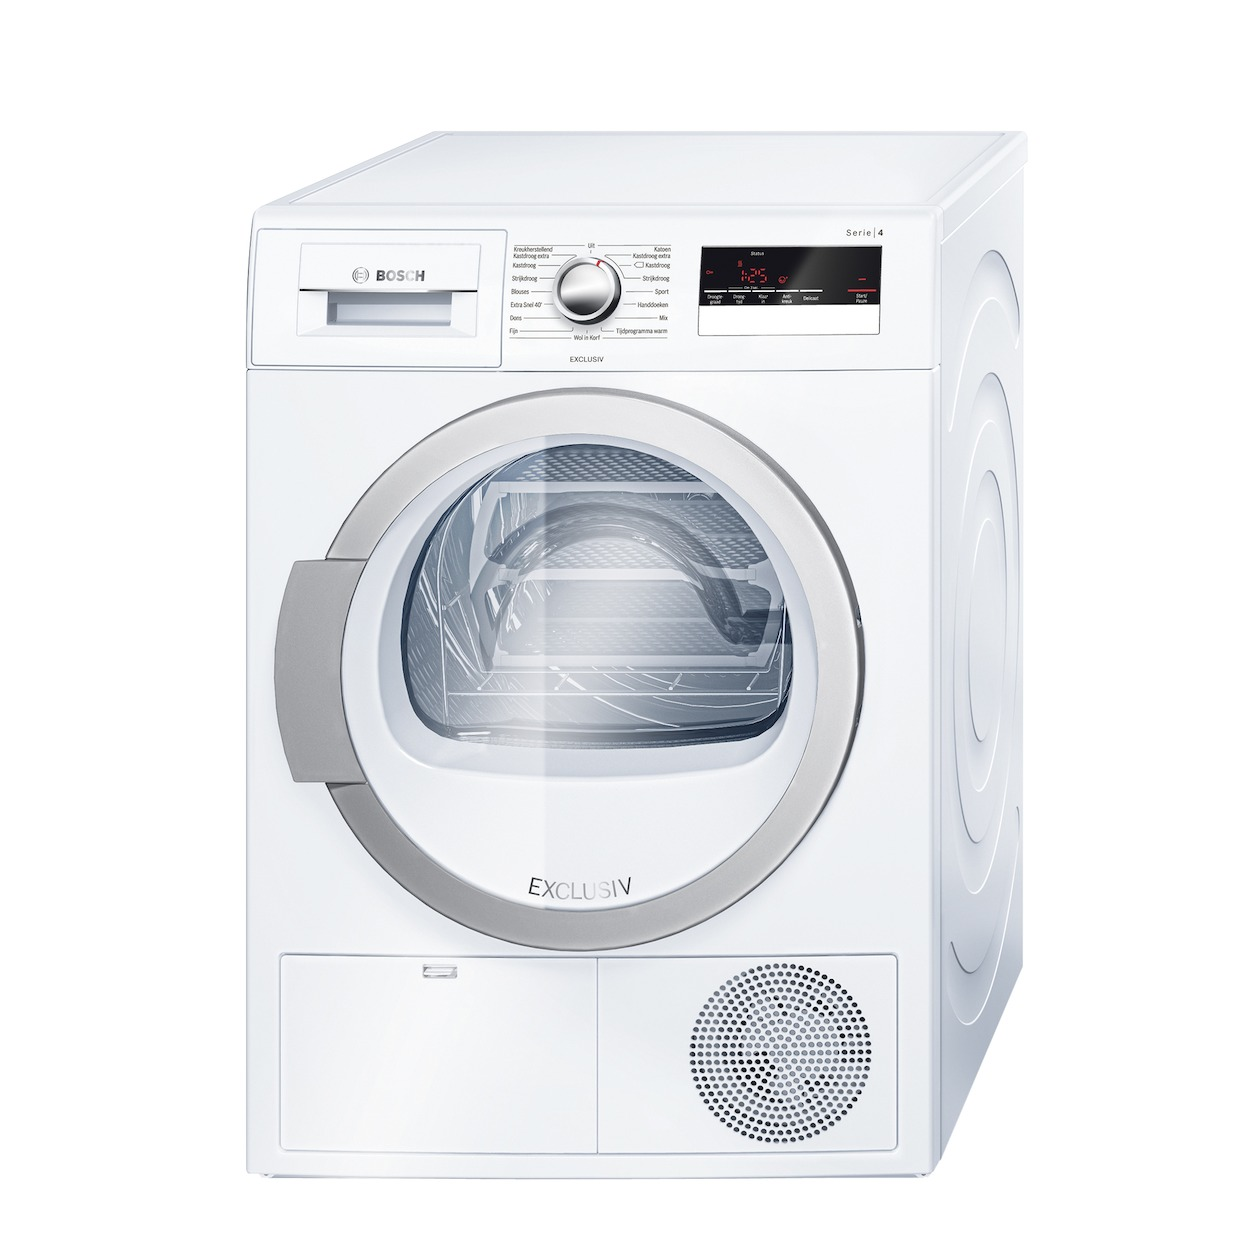 Bosch warmtepompdroger WTH85281NL